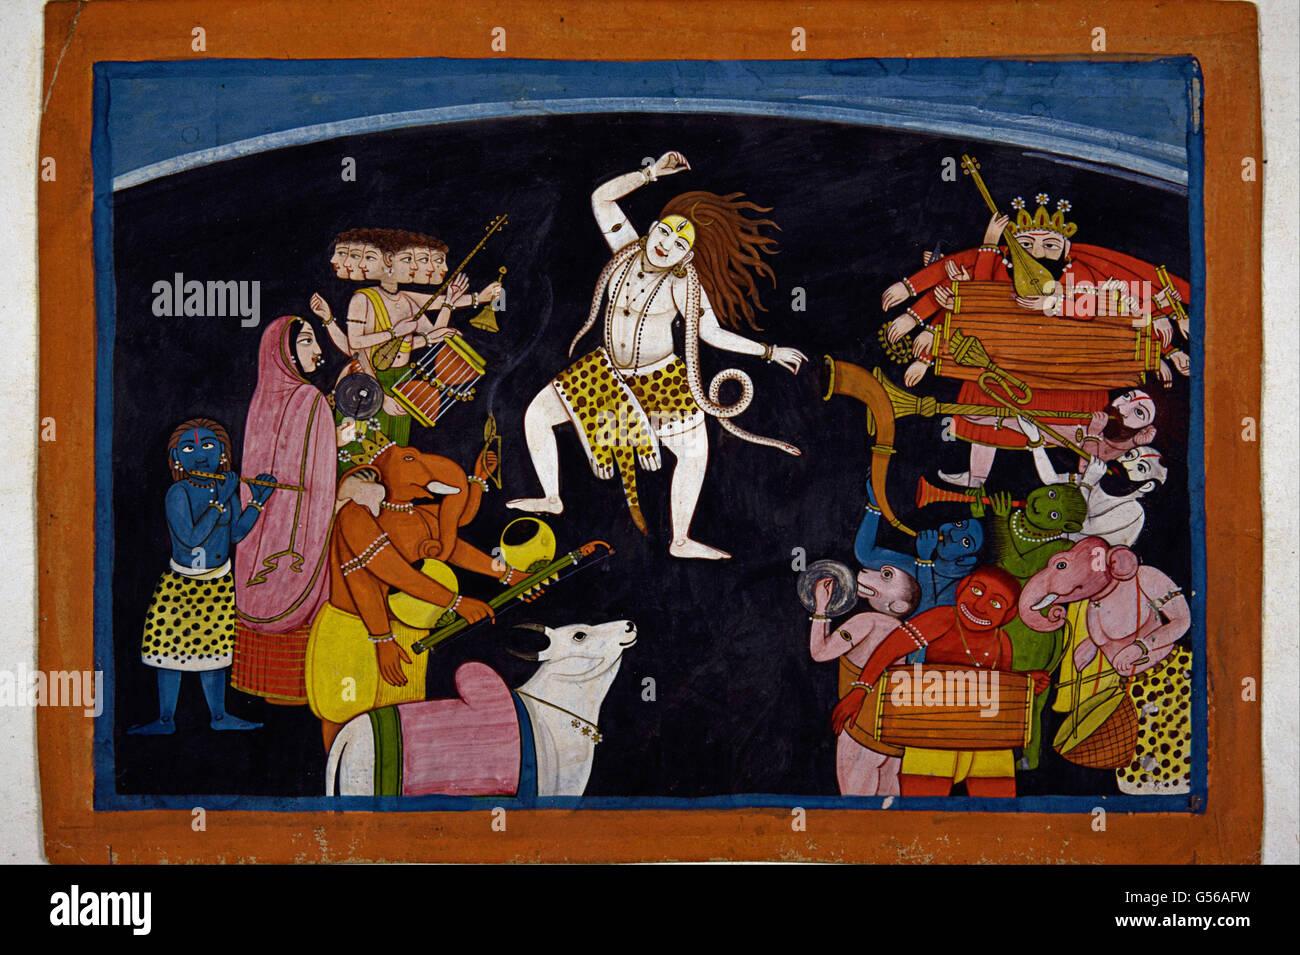 Lord Shiva dancing - Stock Image